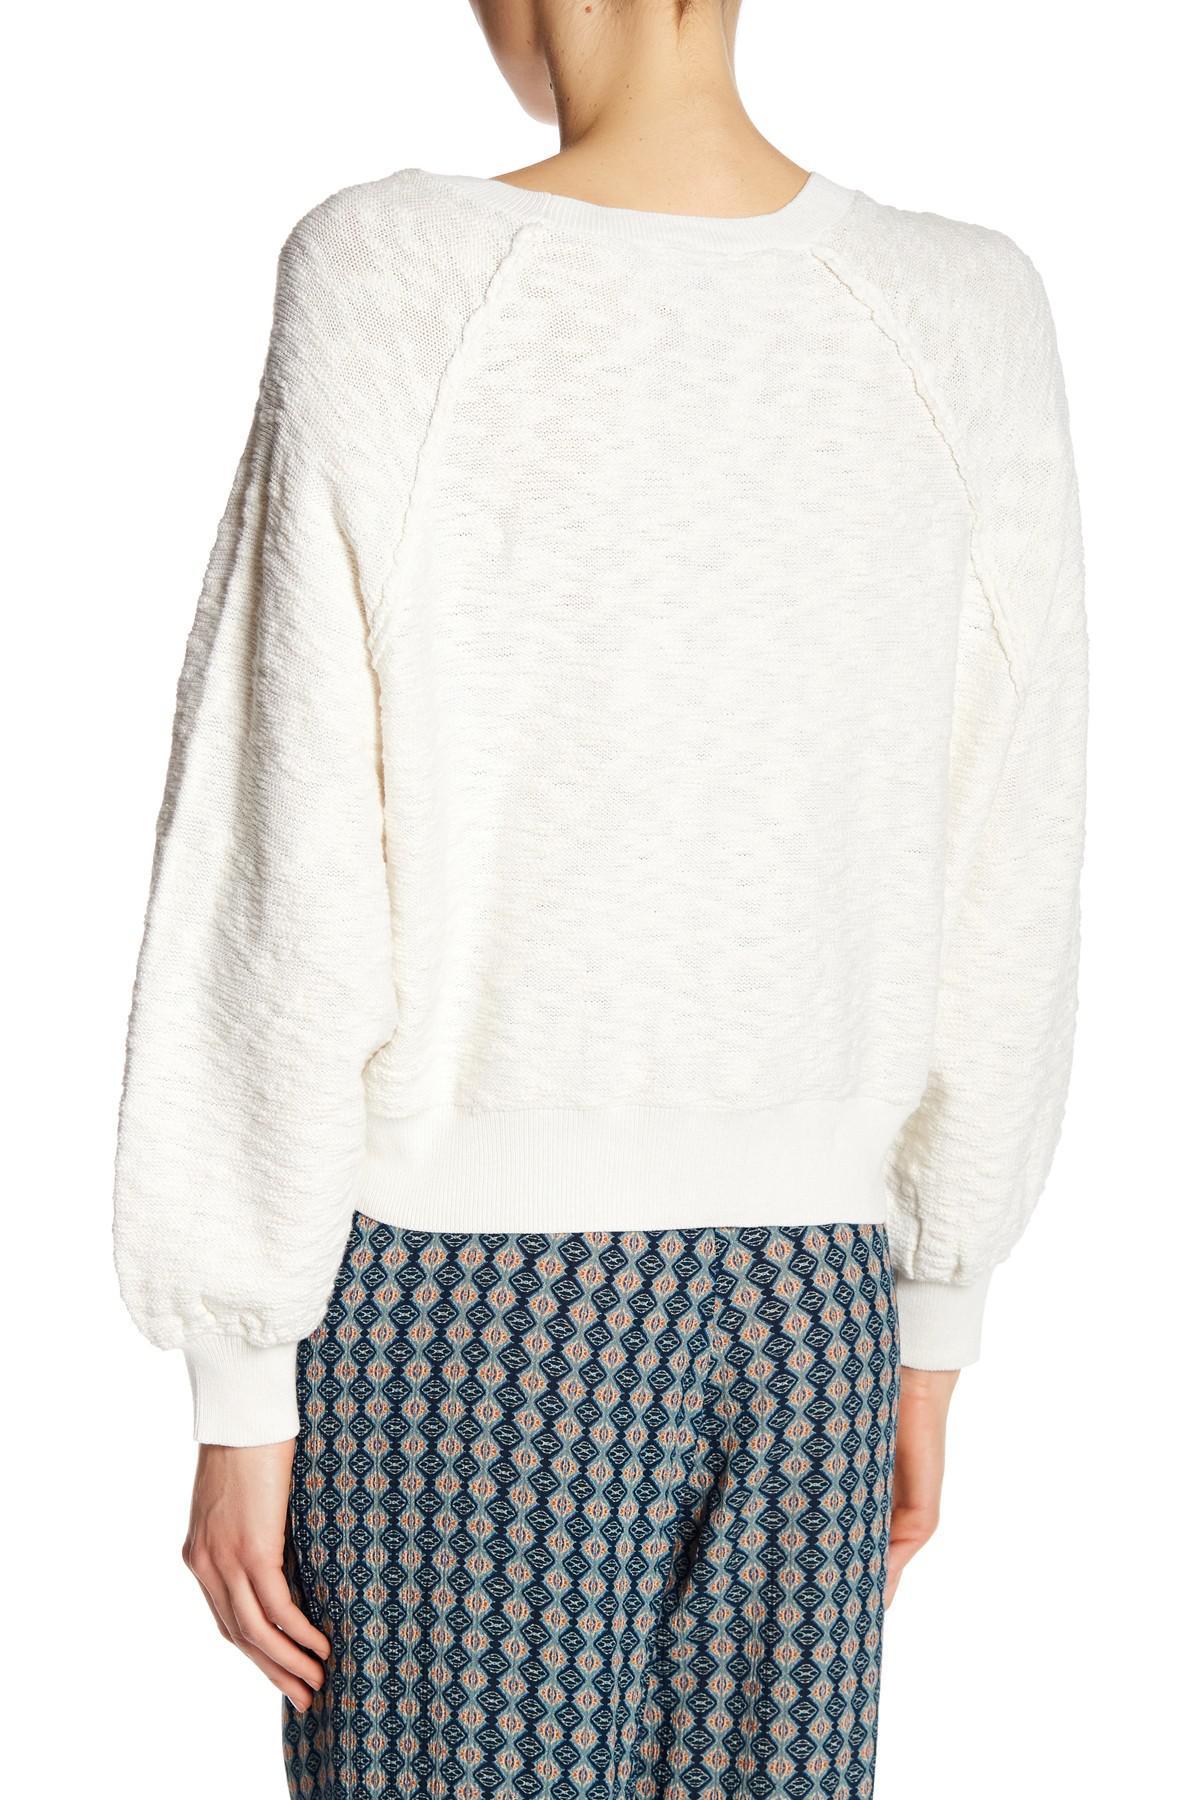 2fcad35e93a Lyst - Dress Forum Raglan Sleeve Sweater in White